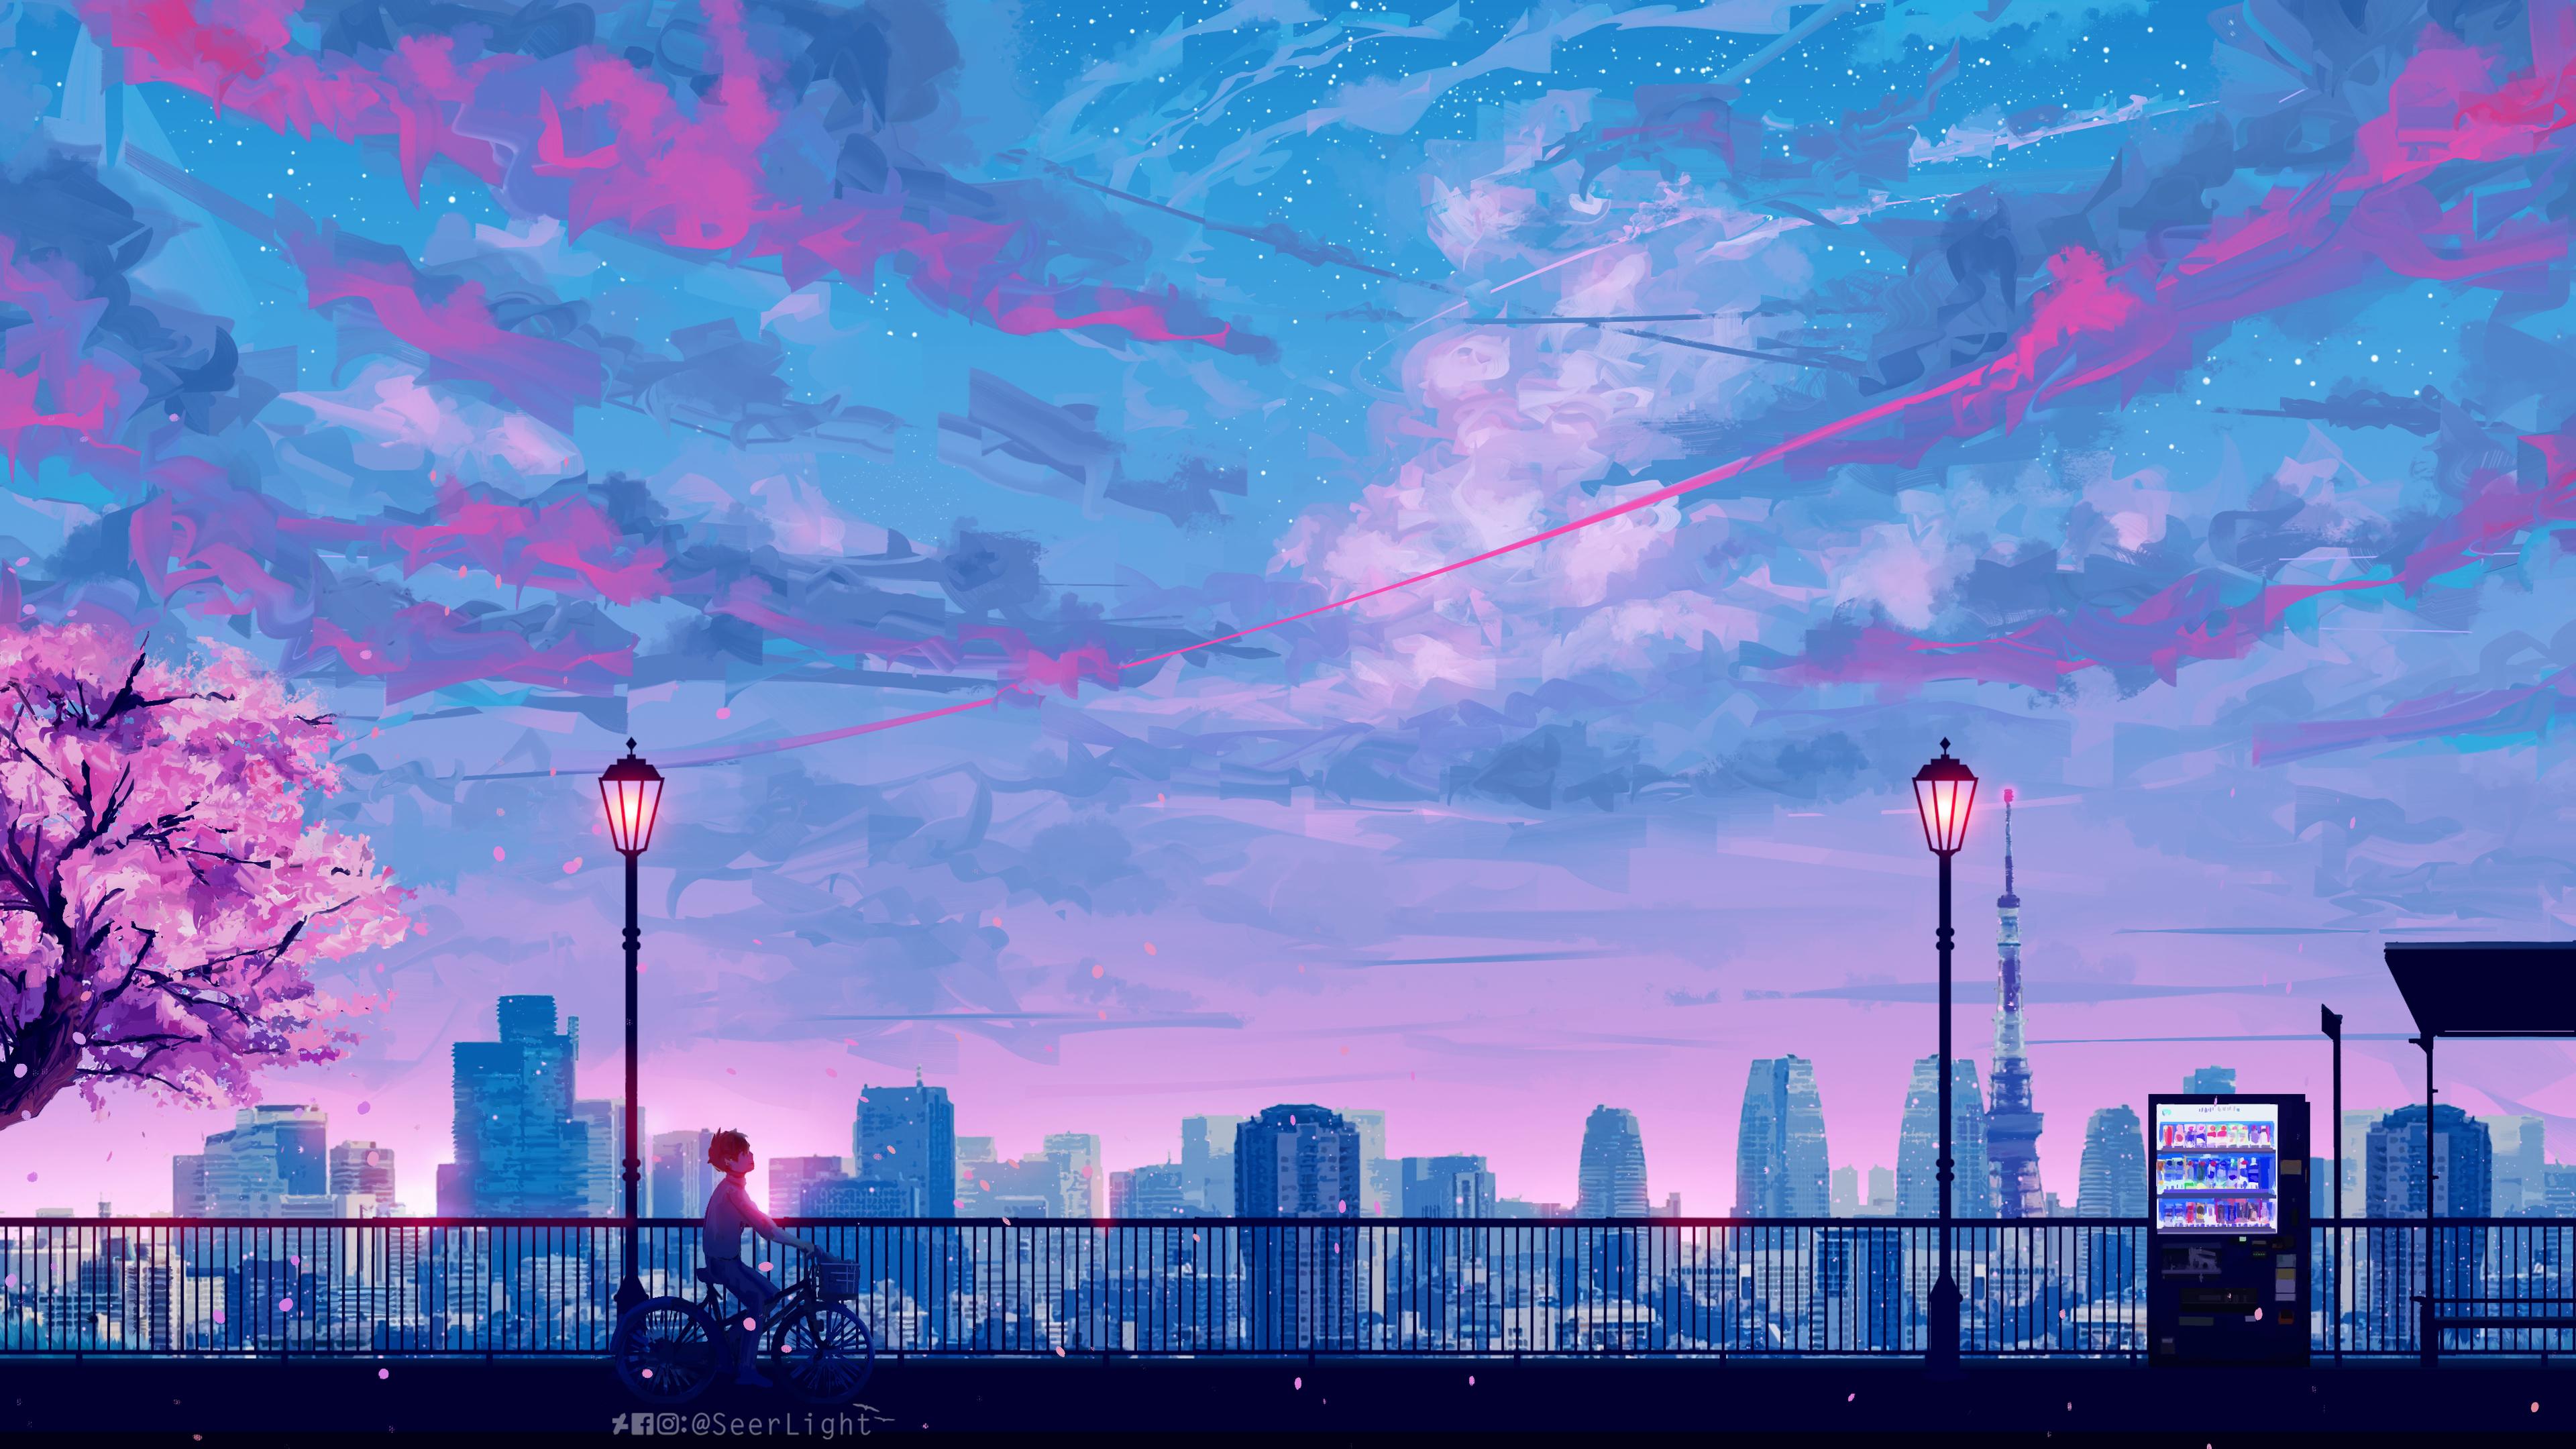 Wallpaper 4k Anime Cityscape Landscape Scenery 4k 4k Wallpapers